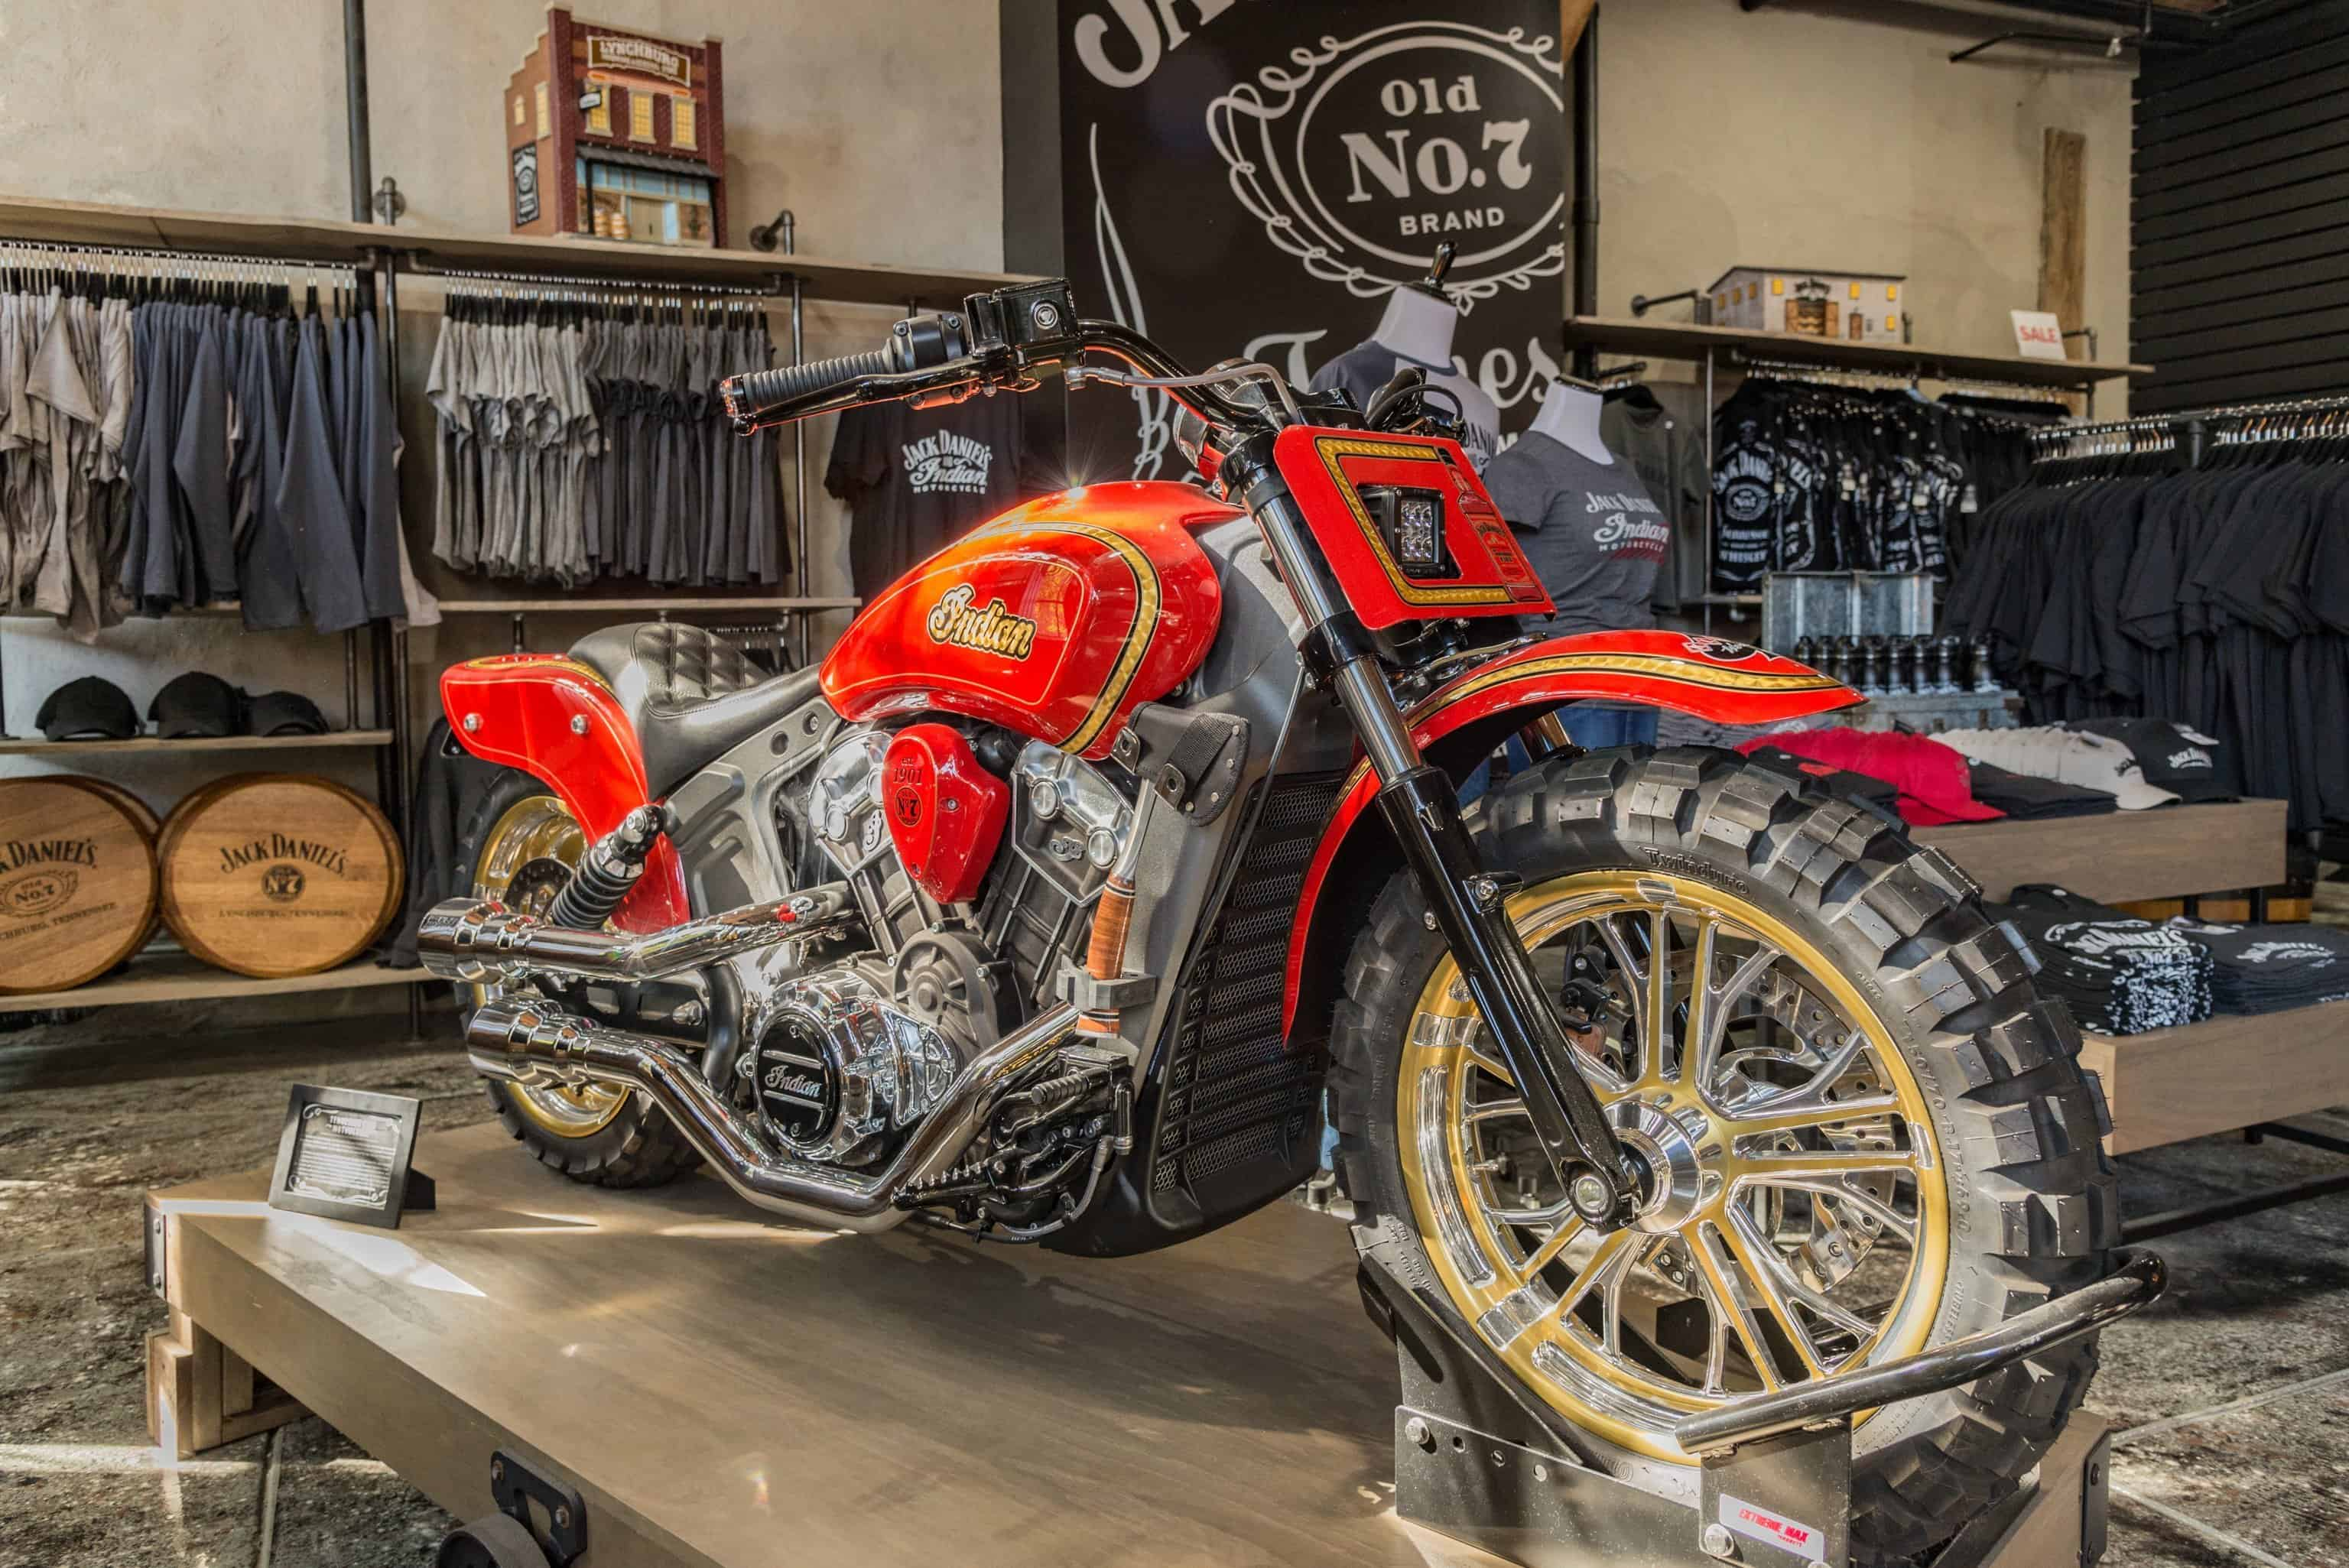 Motorcycle in Nashville